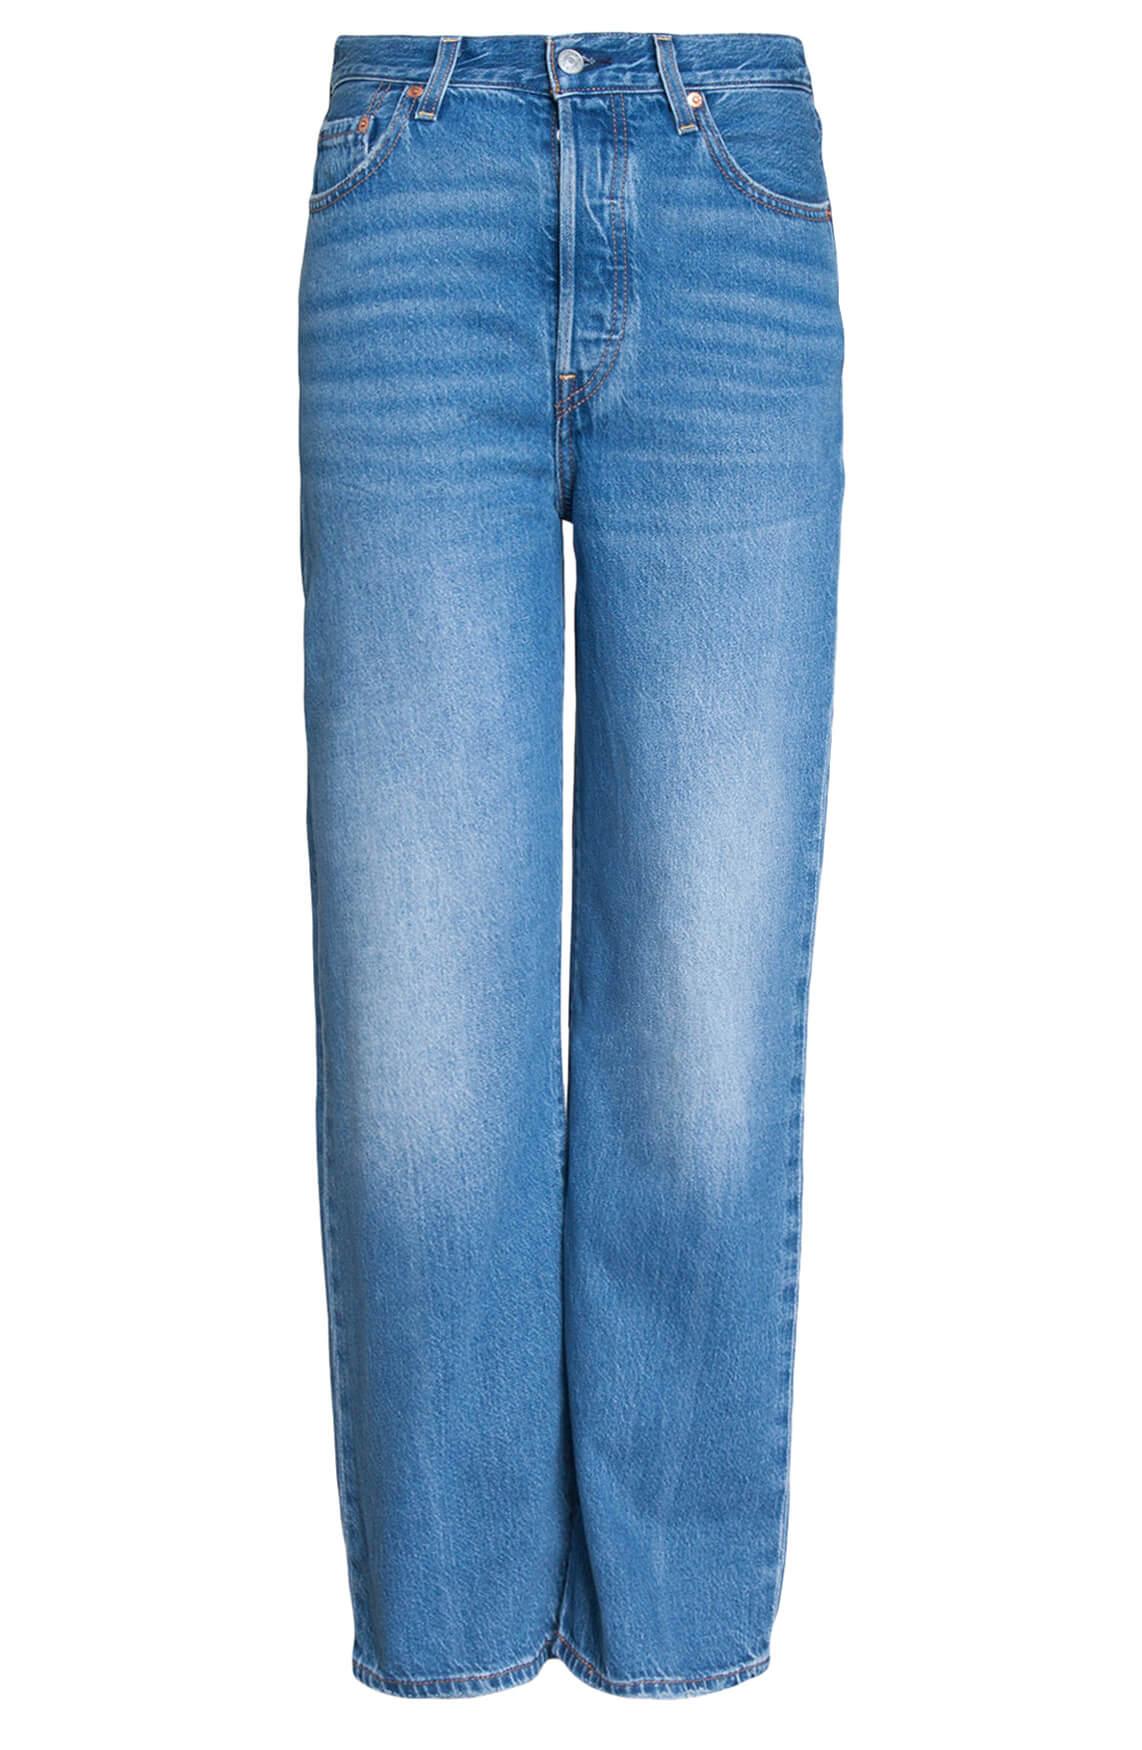 Levi s Dames Ribcage straight jeans Blauw